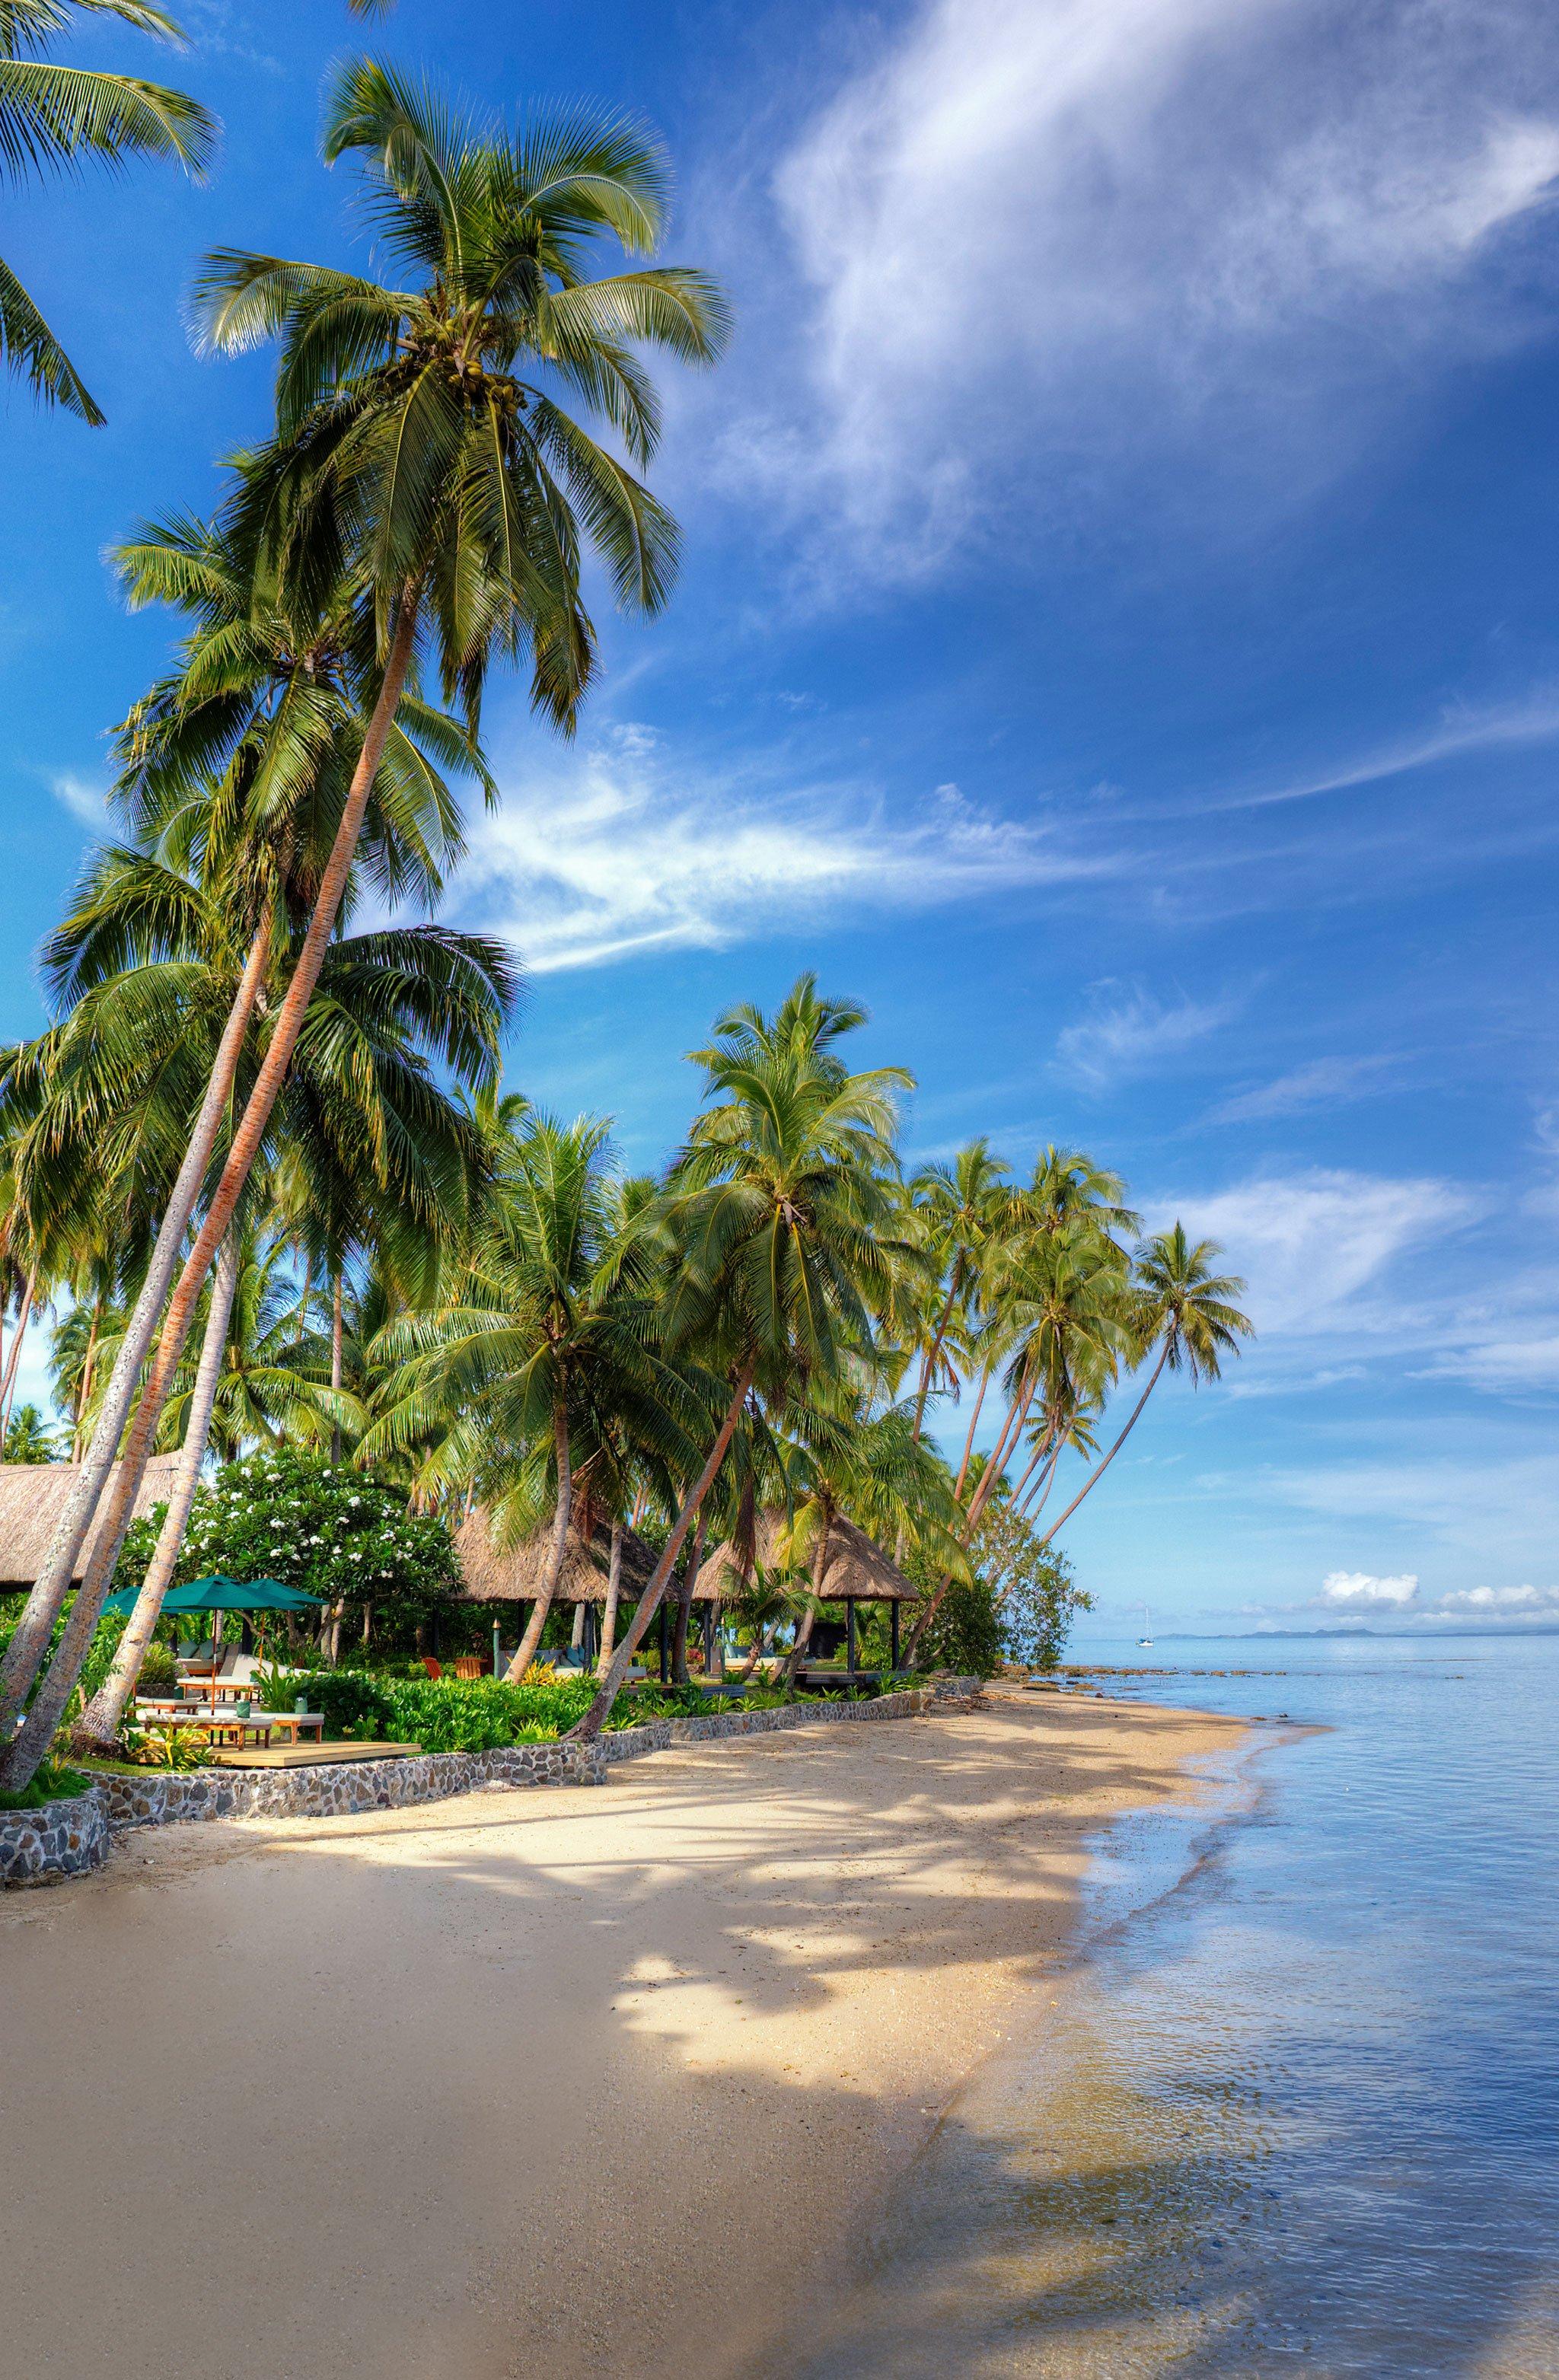 Canyon Equity - Jean Michel Cousteau Resort Vanua Levu Fiji